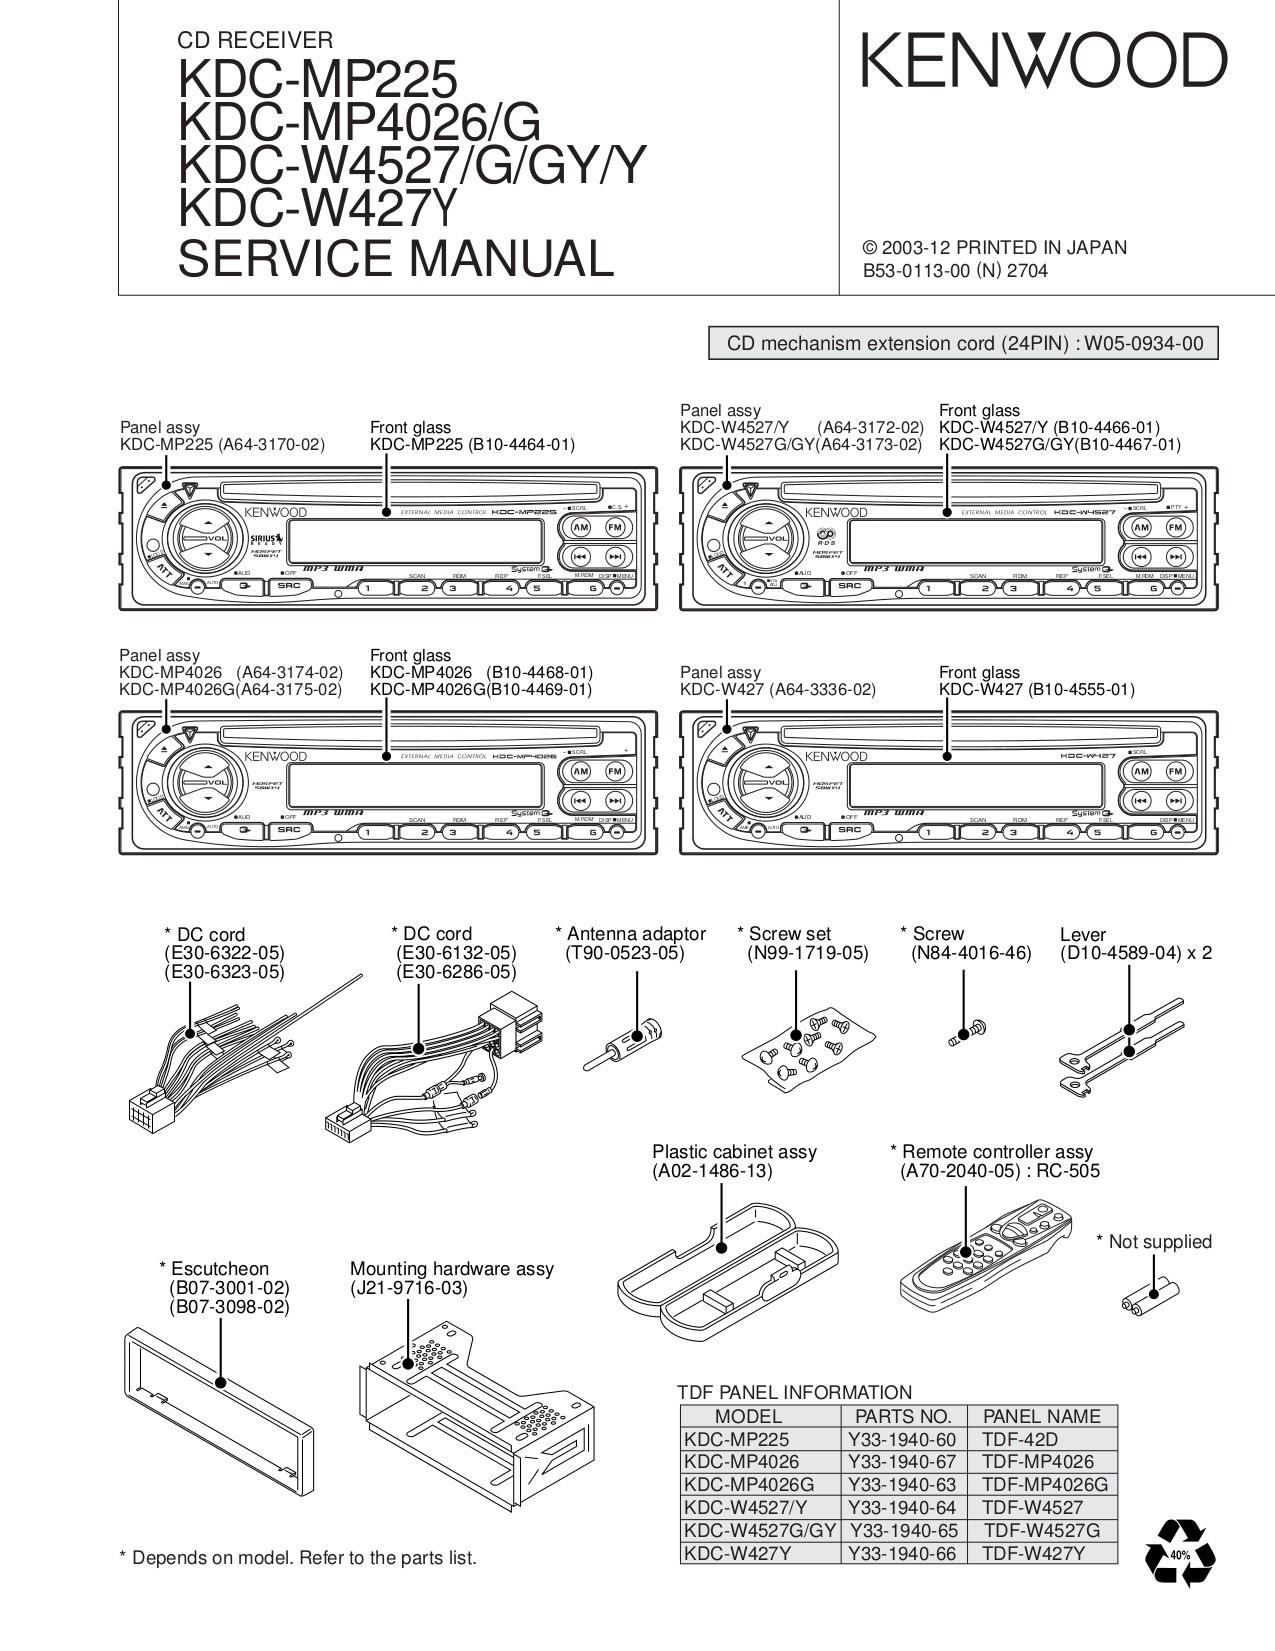 Me Wood Kdc-108 Cd Receiver Wiring Diagram Kenwood Kdc 108 Wiring Harness Of Me Wood Kdc-108 Cd Receiver Wiring Diagram